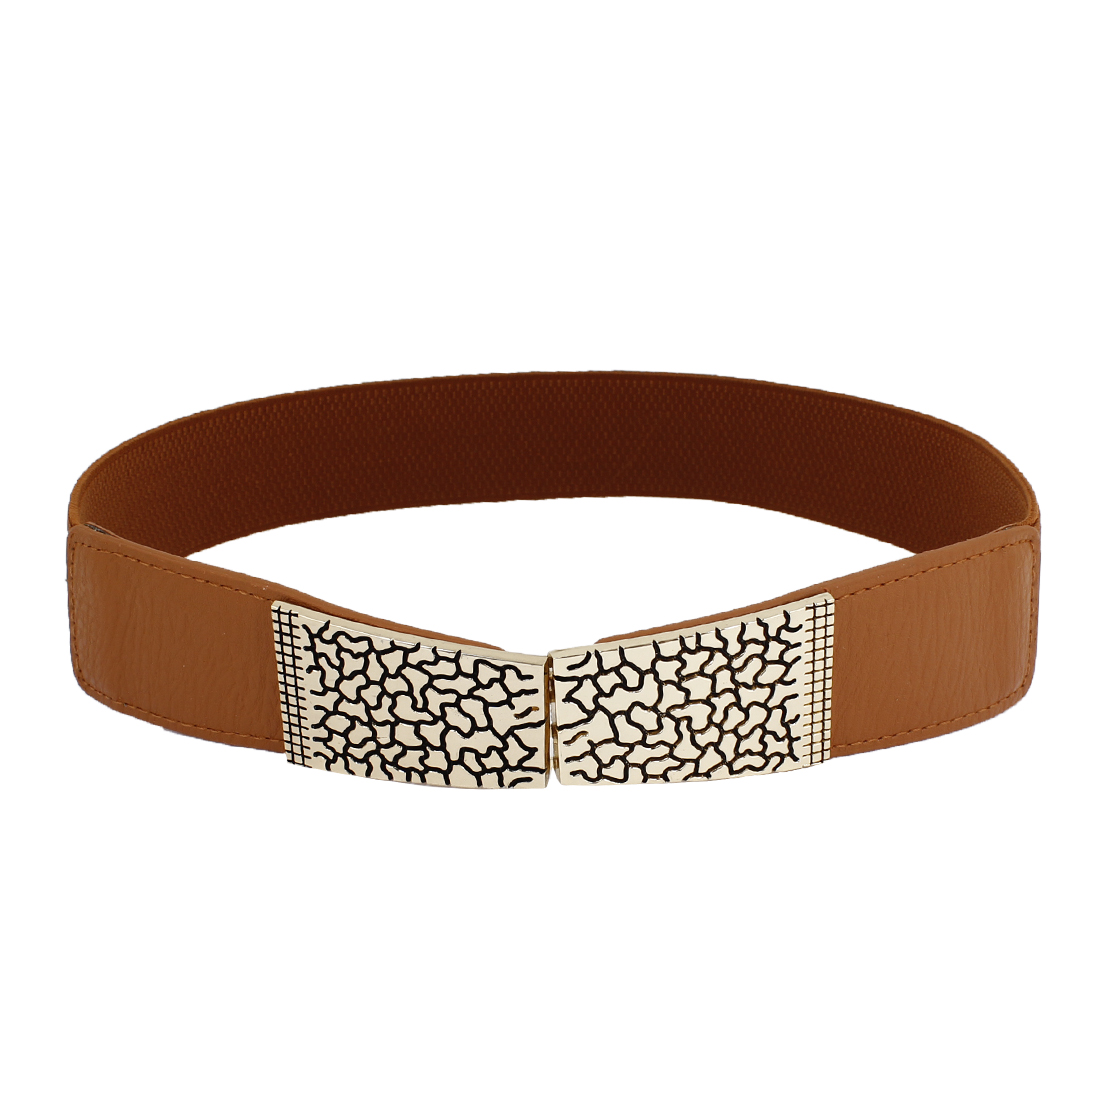 Woman Lady Crack Design Metal Interlock Buckle Eleastic Cinch Belt Brown